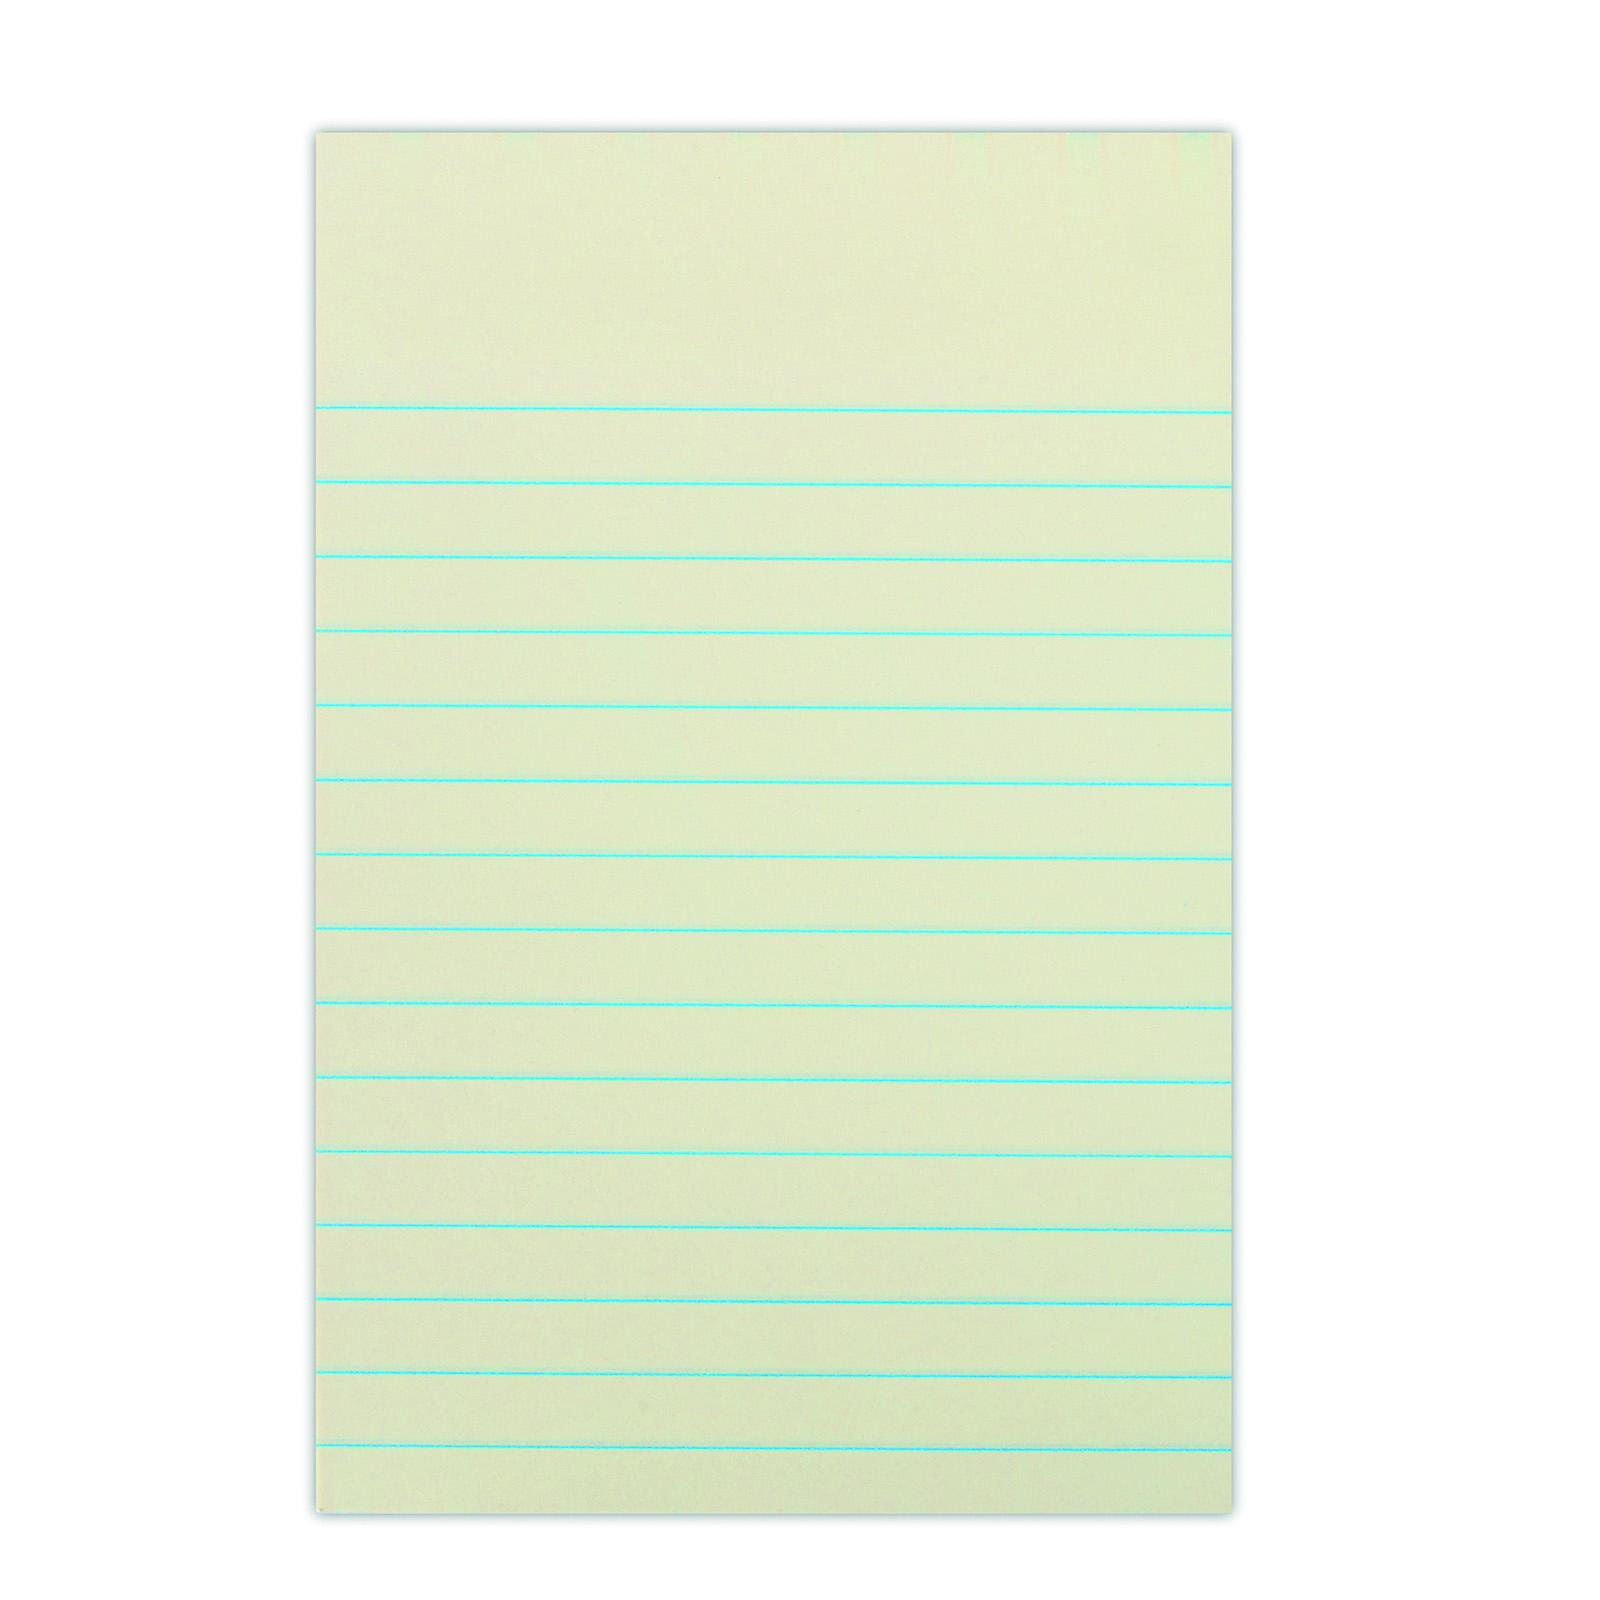 Self-adhesive Pad DONAU 101x150mm, ruled, 1x100 sheets, 75gsm ...